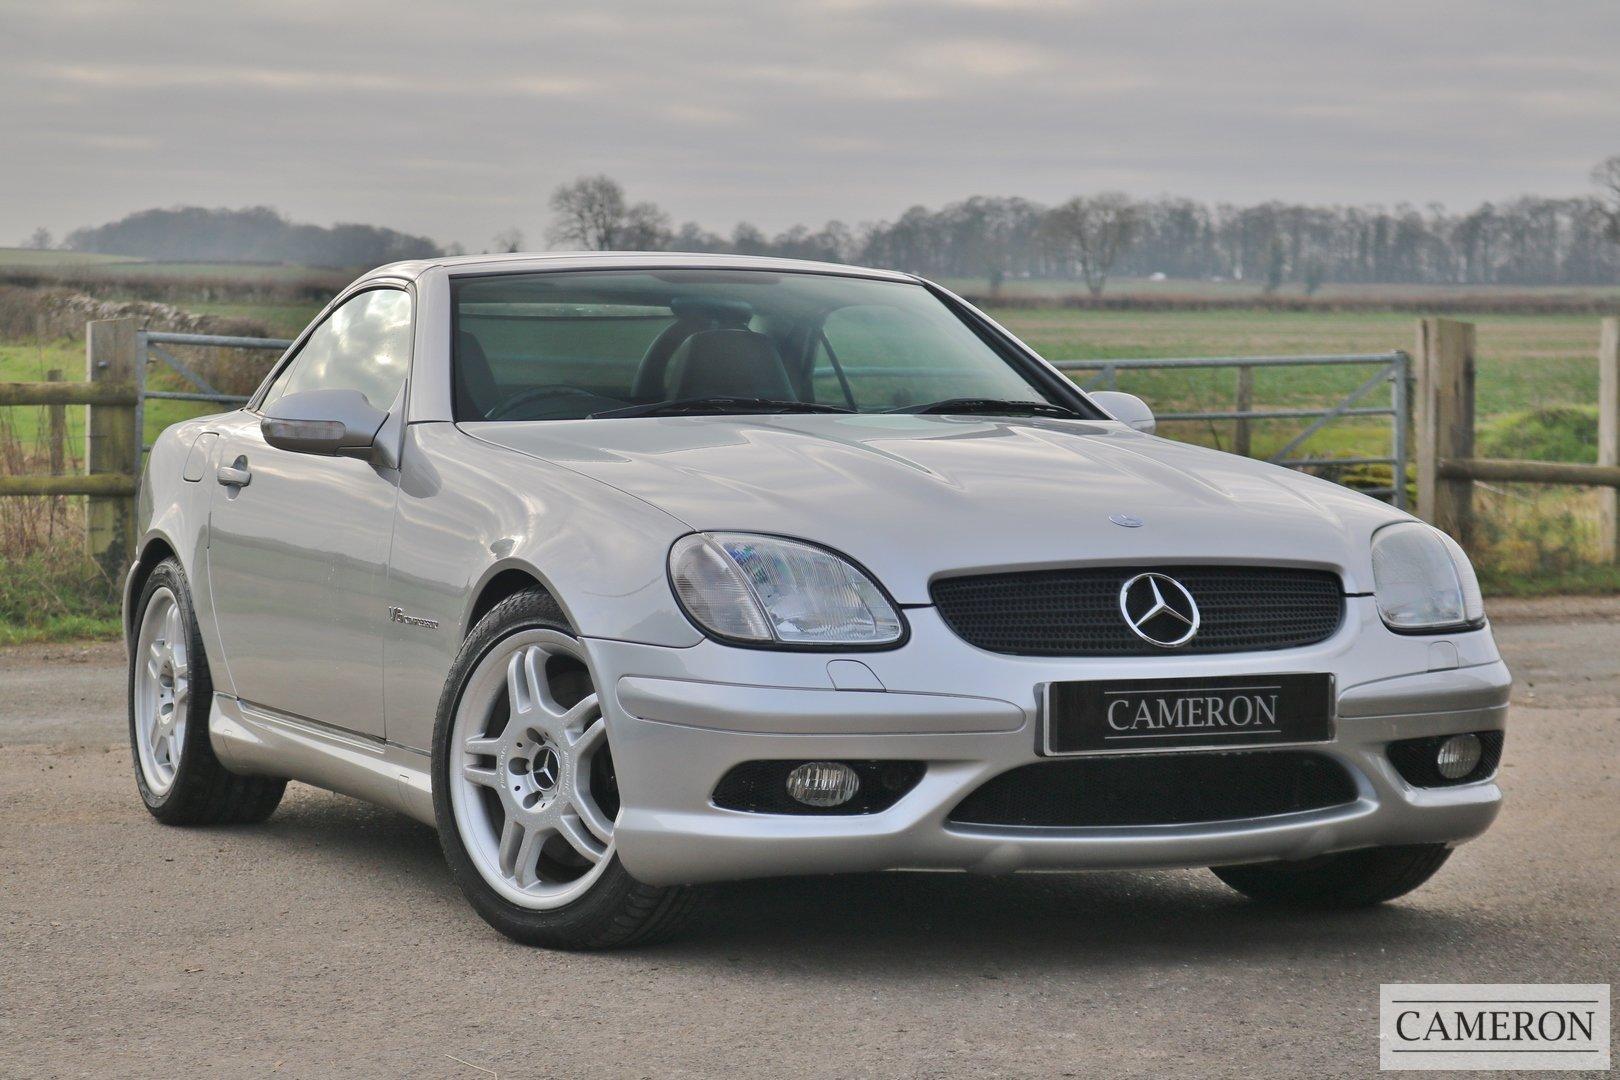 2003 Mercedes Benz SLK 32 AMG  For Sale (picture 1 of 6)